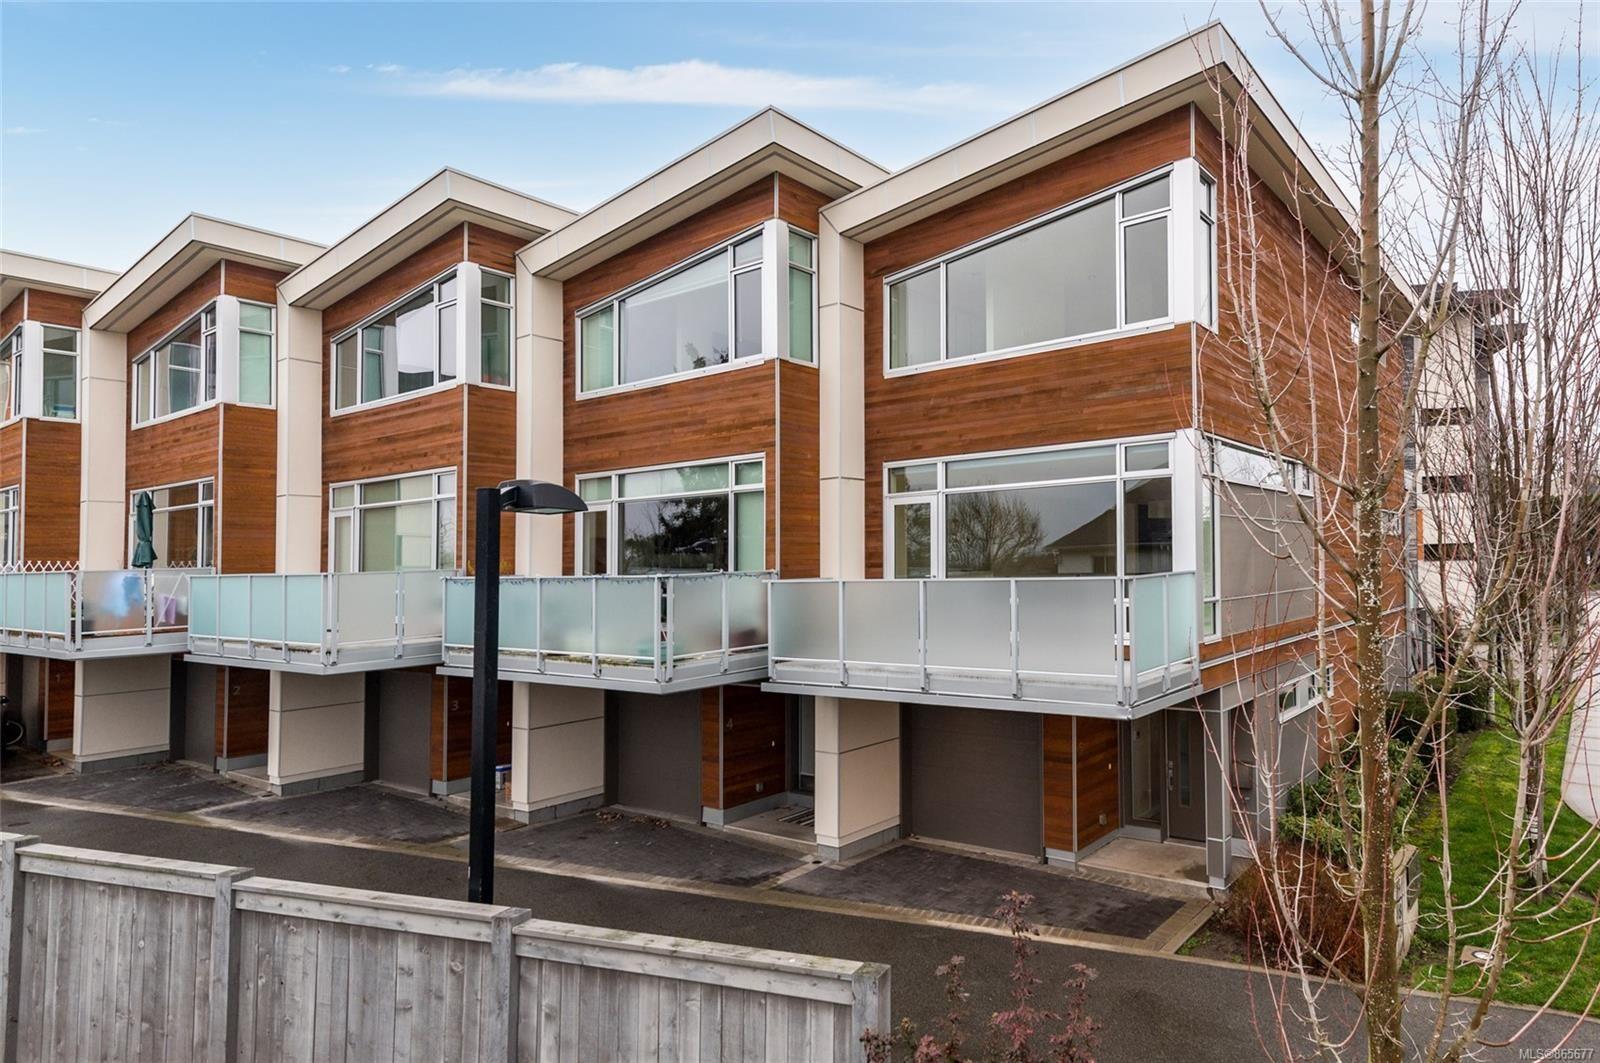 Main Photo: 5 2830 Irma St in : Vi Burnside Row/Townhouse for sale (Victoria)  : MLS®# 865677